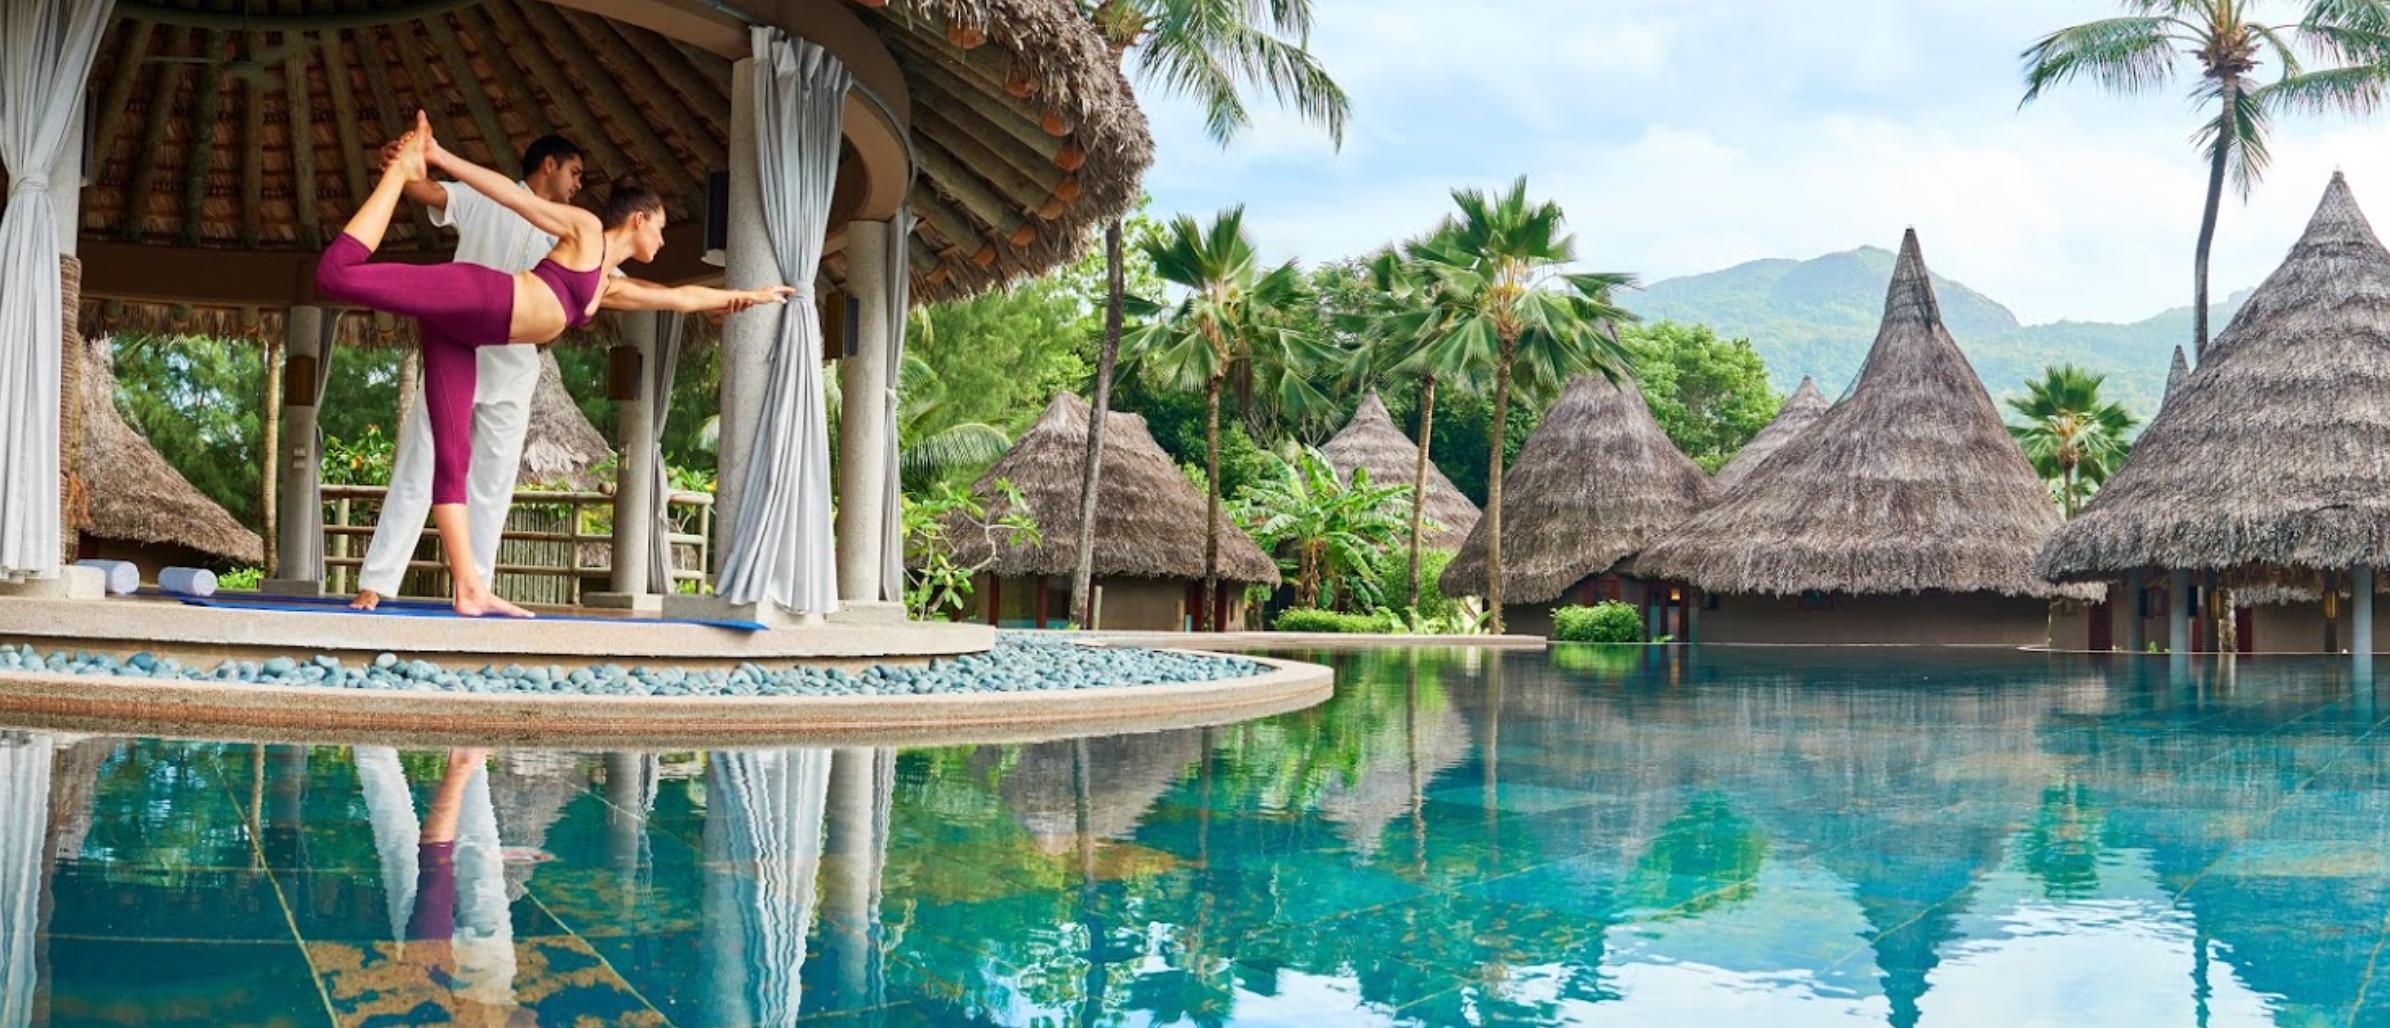 Reasons to Visit Seychelles